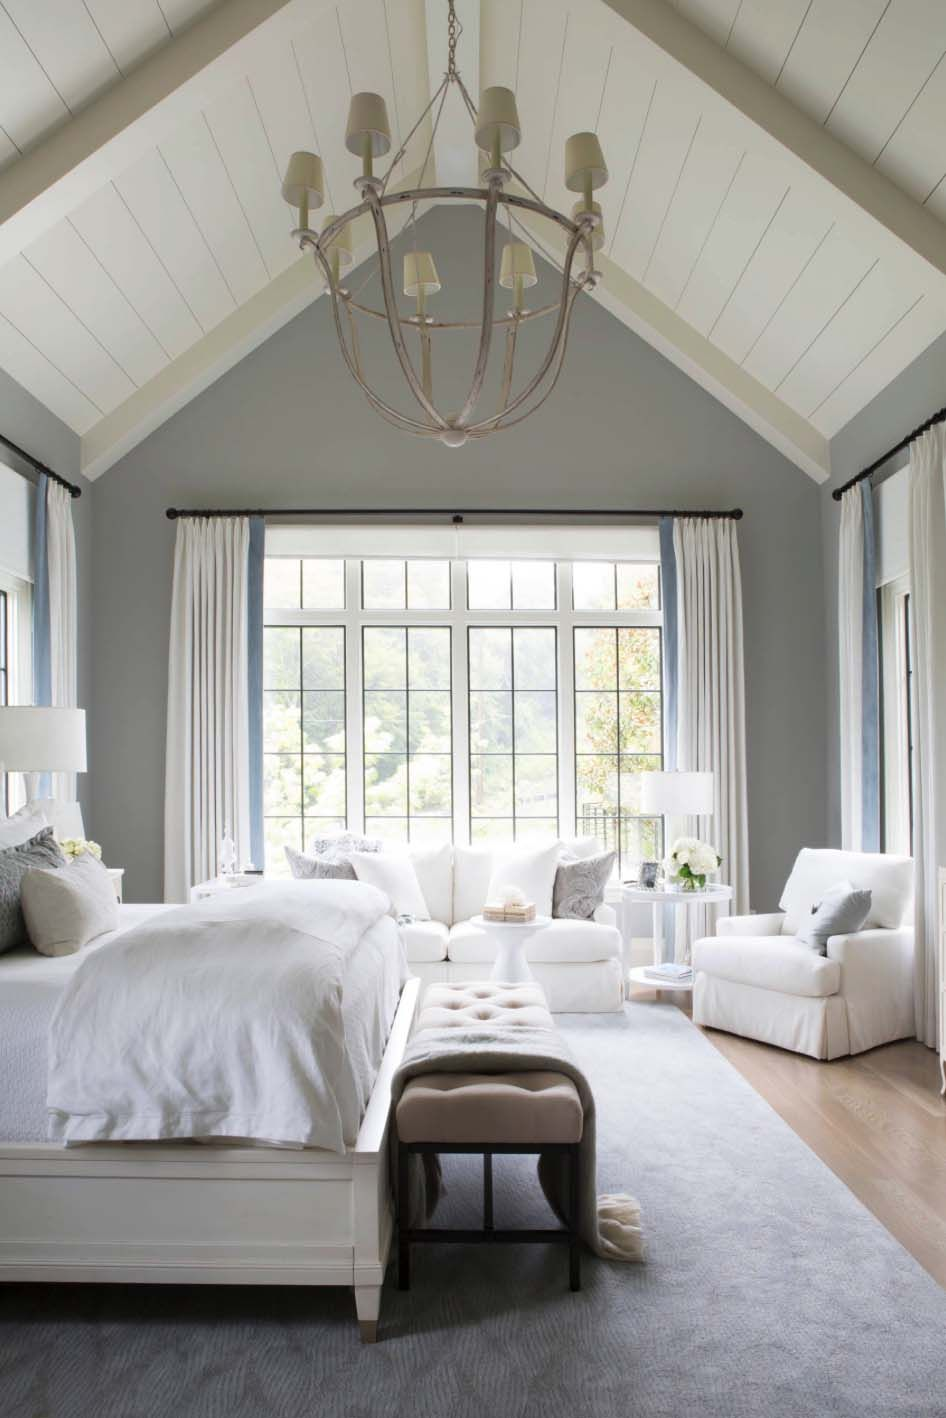 20 Serene And Elegant Master Bedroom Decorating Ideas Large